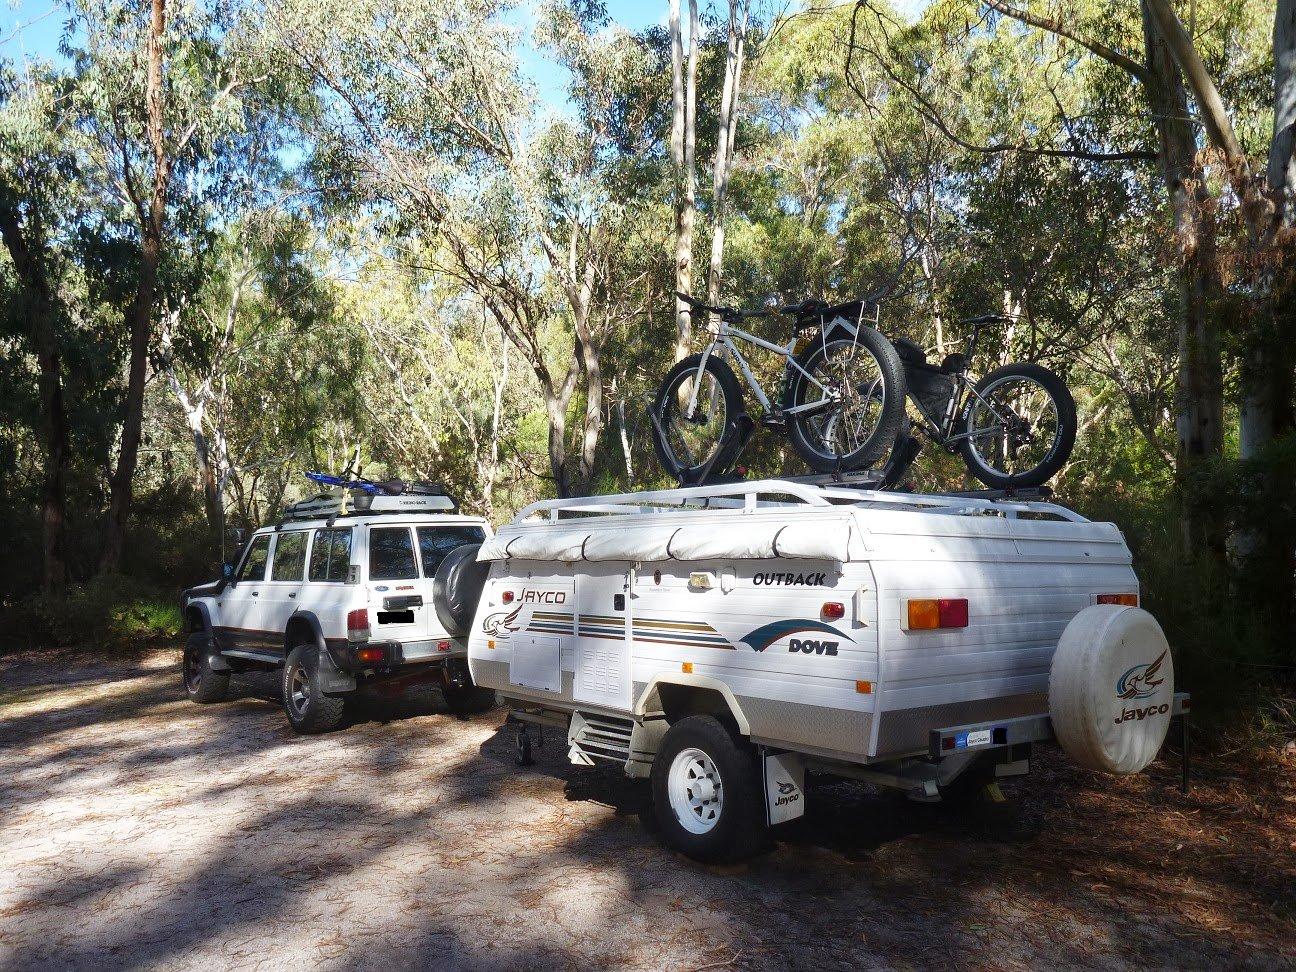 iload krs hyundai made image racks yakima roof loading itm is australian details rack about